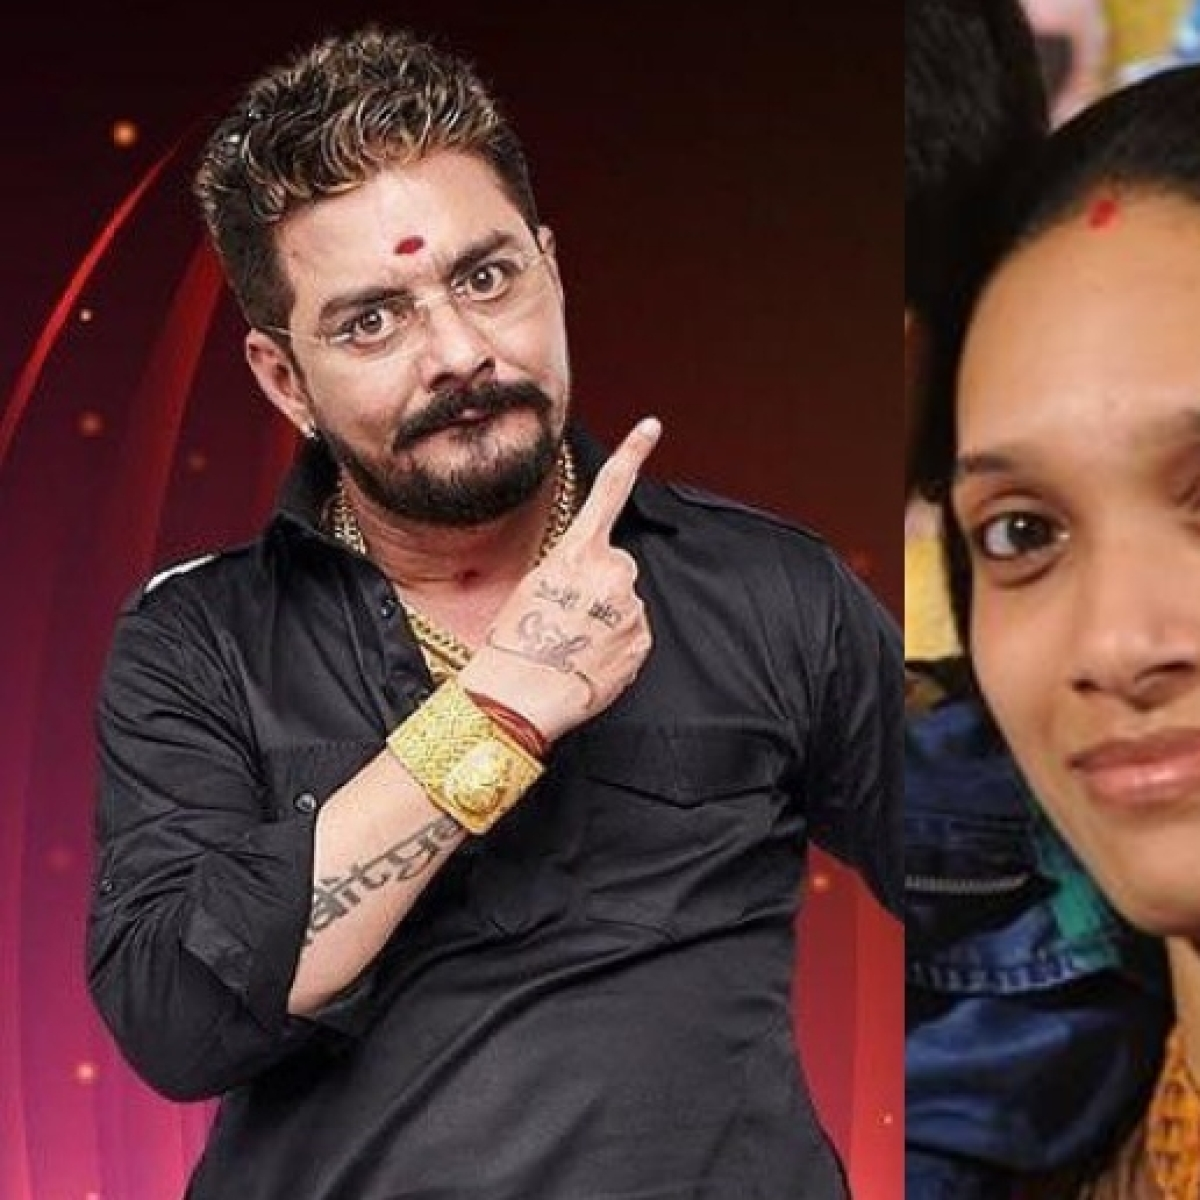 Bigg Boss 13: Hindustani Bhau's wife files complaint regarding incorrect statements against him